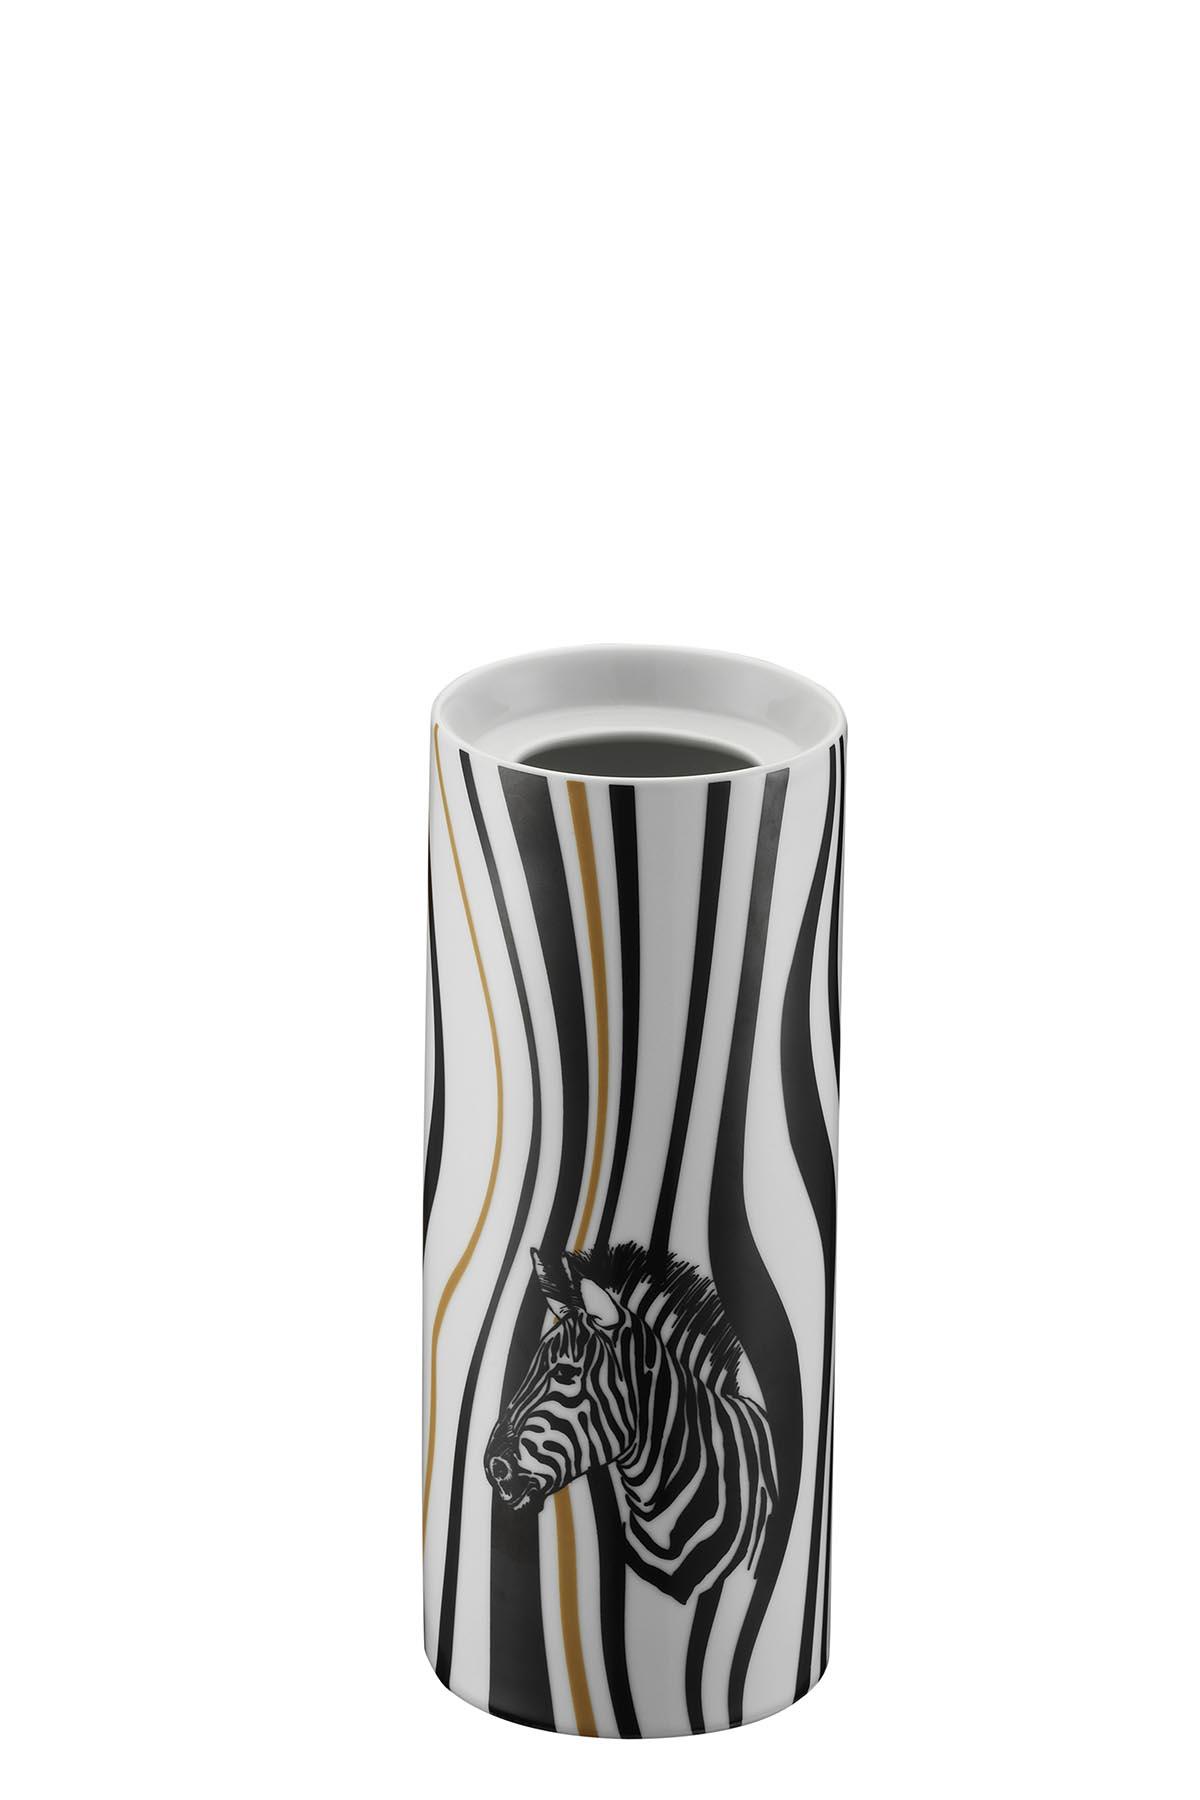 Kütahya Porselen Modern 2 Parça Vazo Takımı 109191